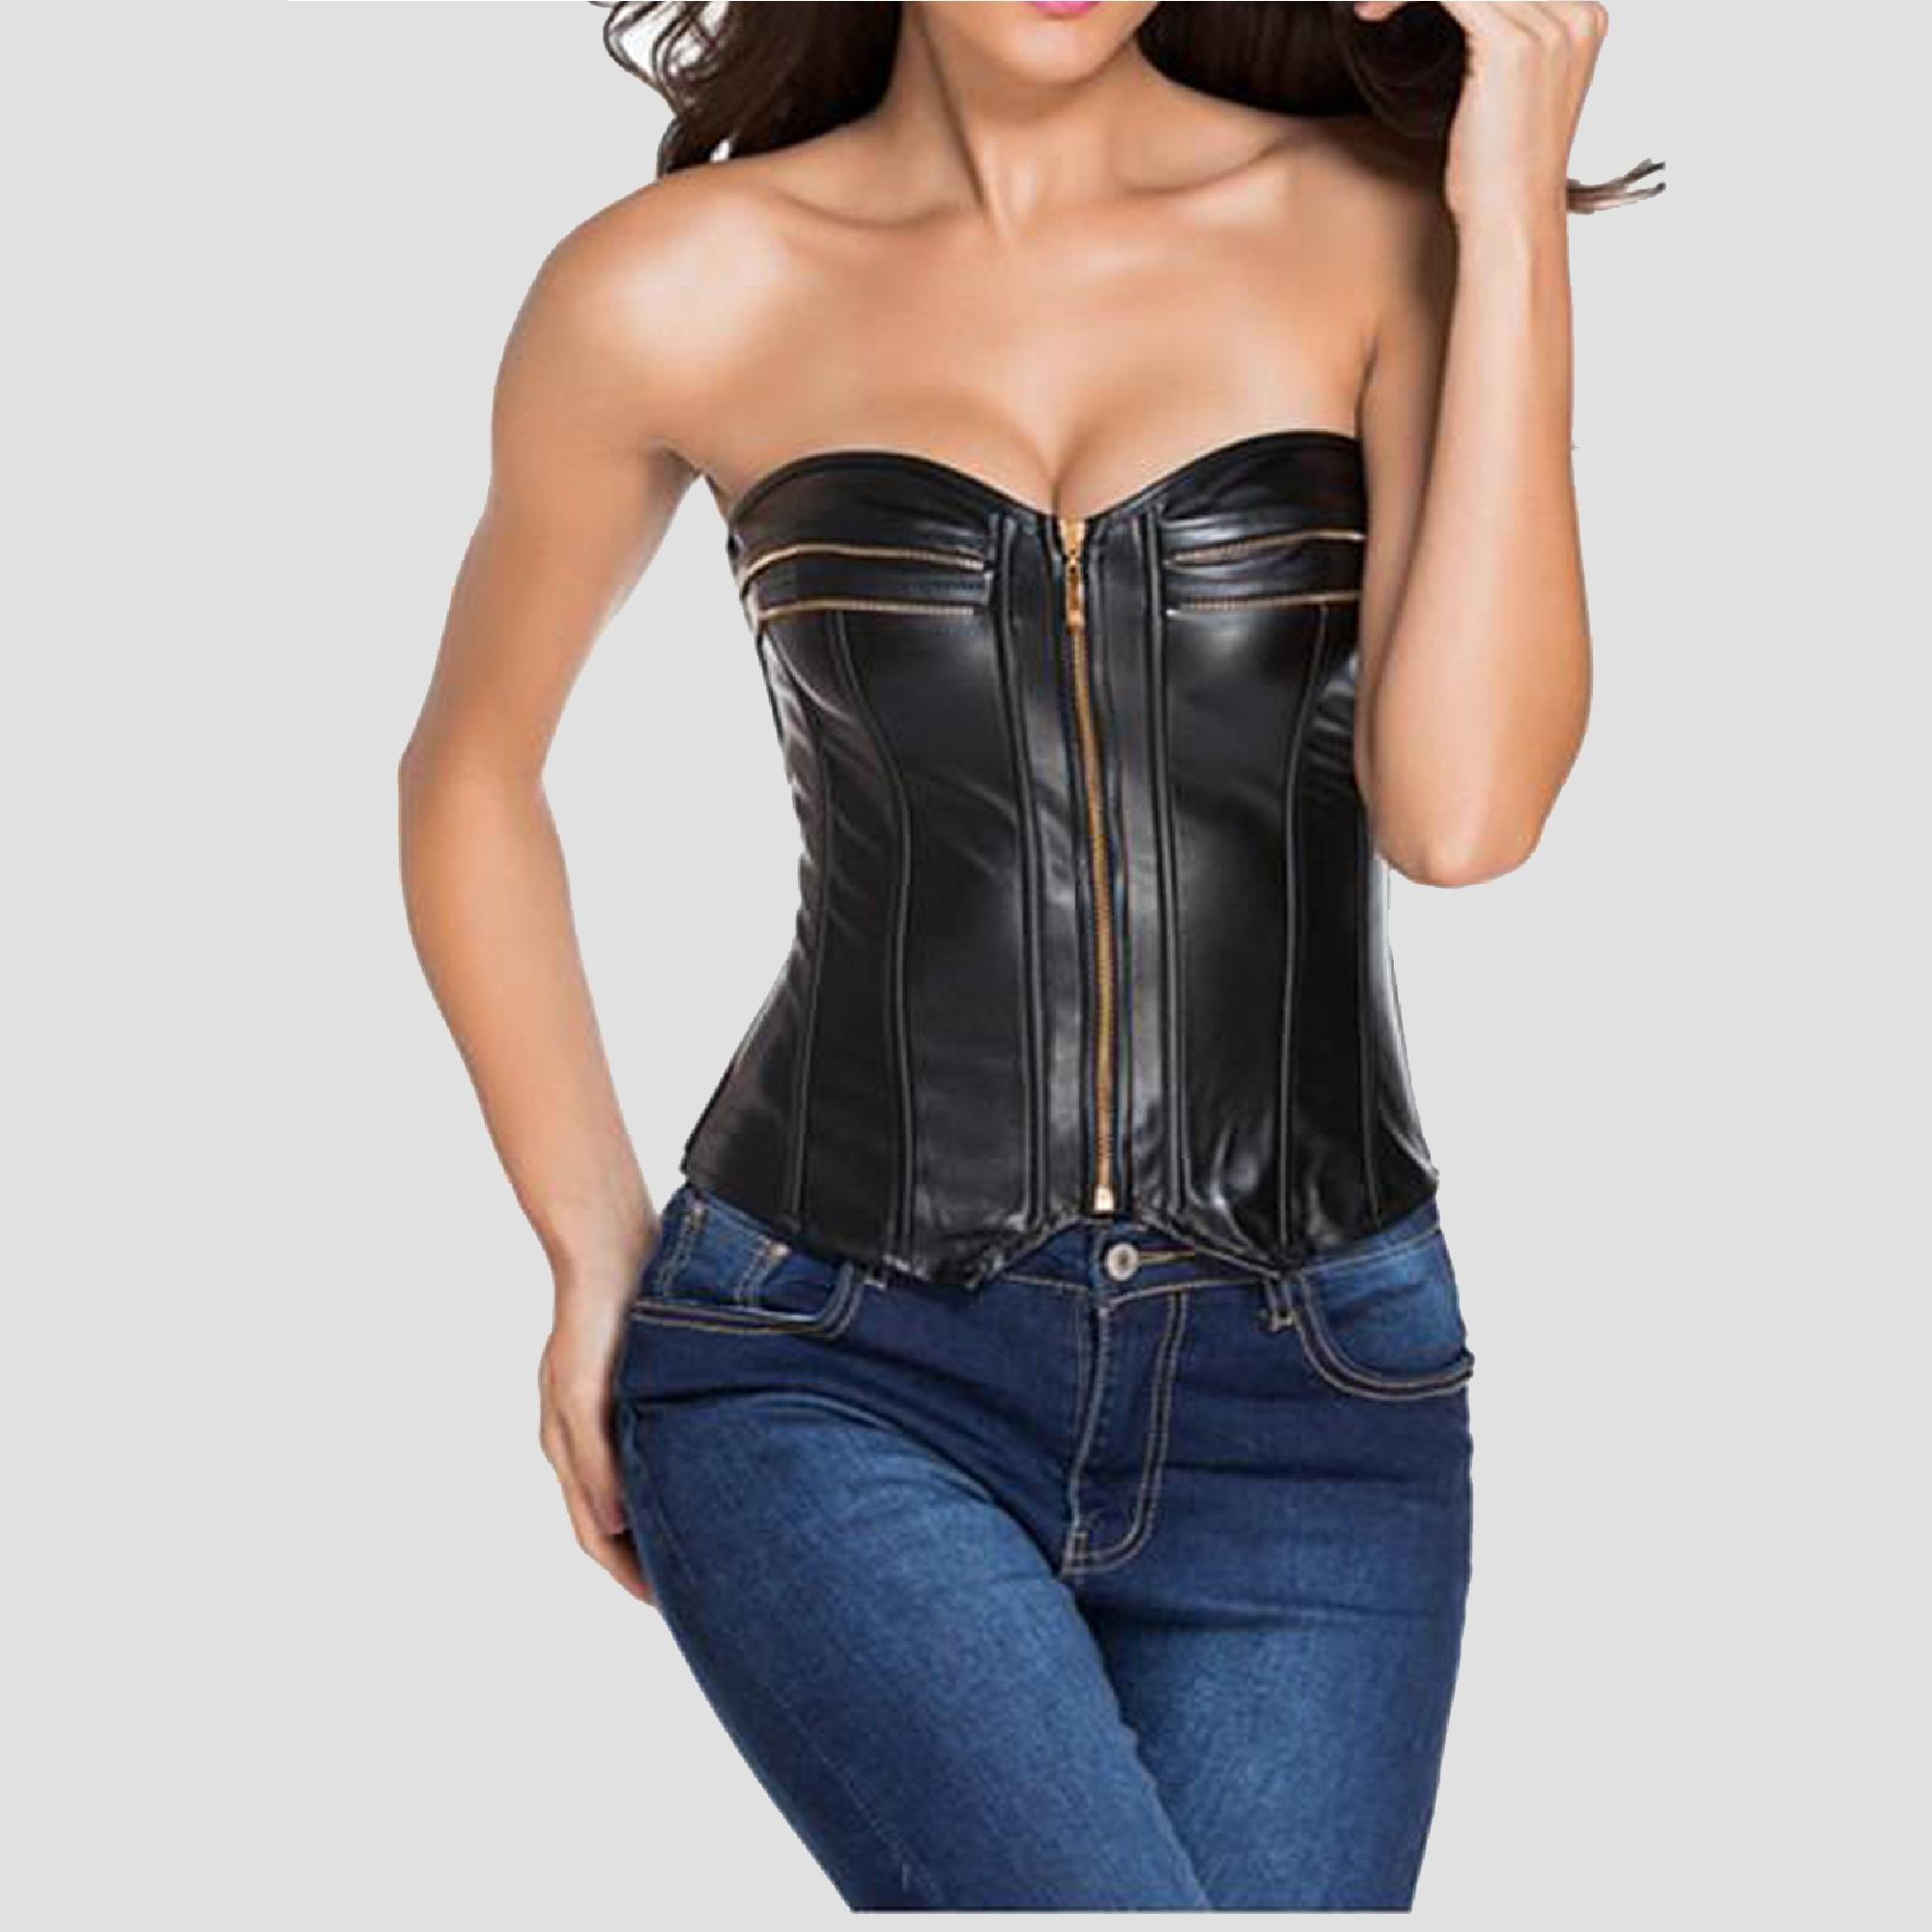 EShine CO Womens Satin Underbust Lace up Back Corset Top